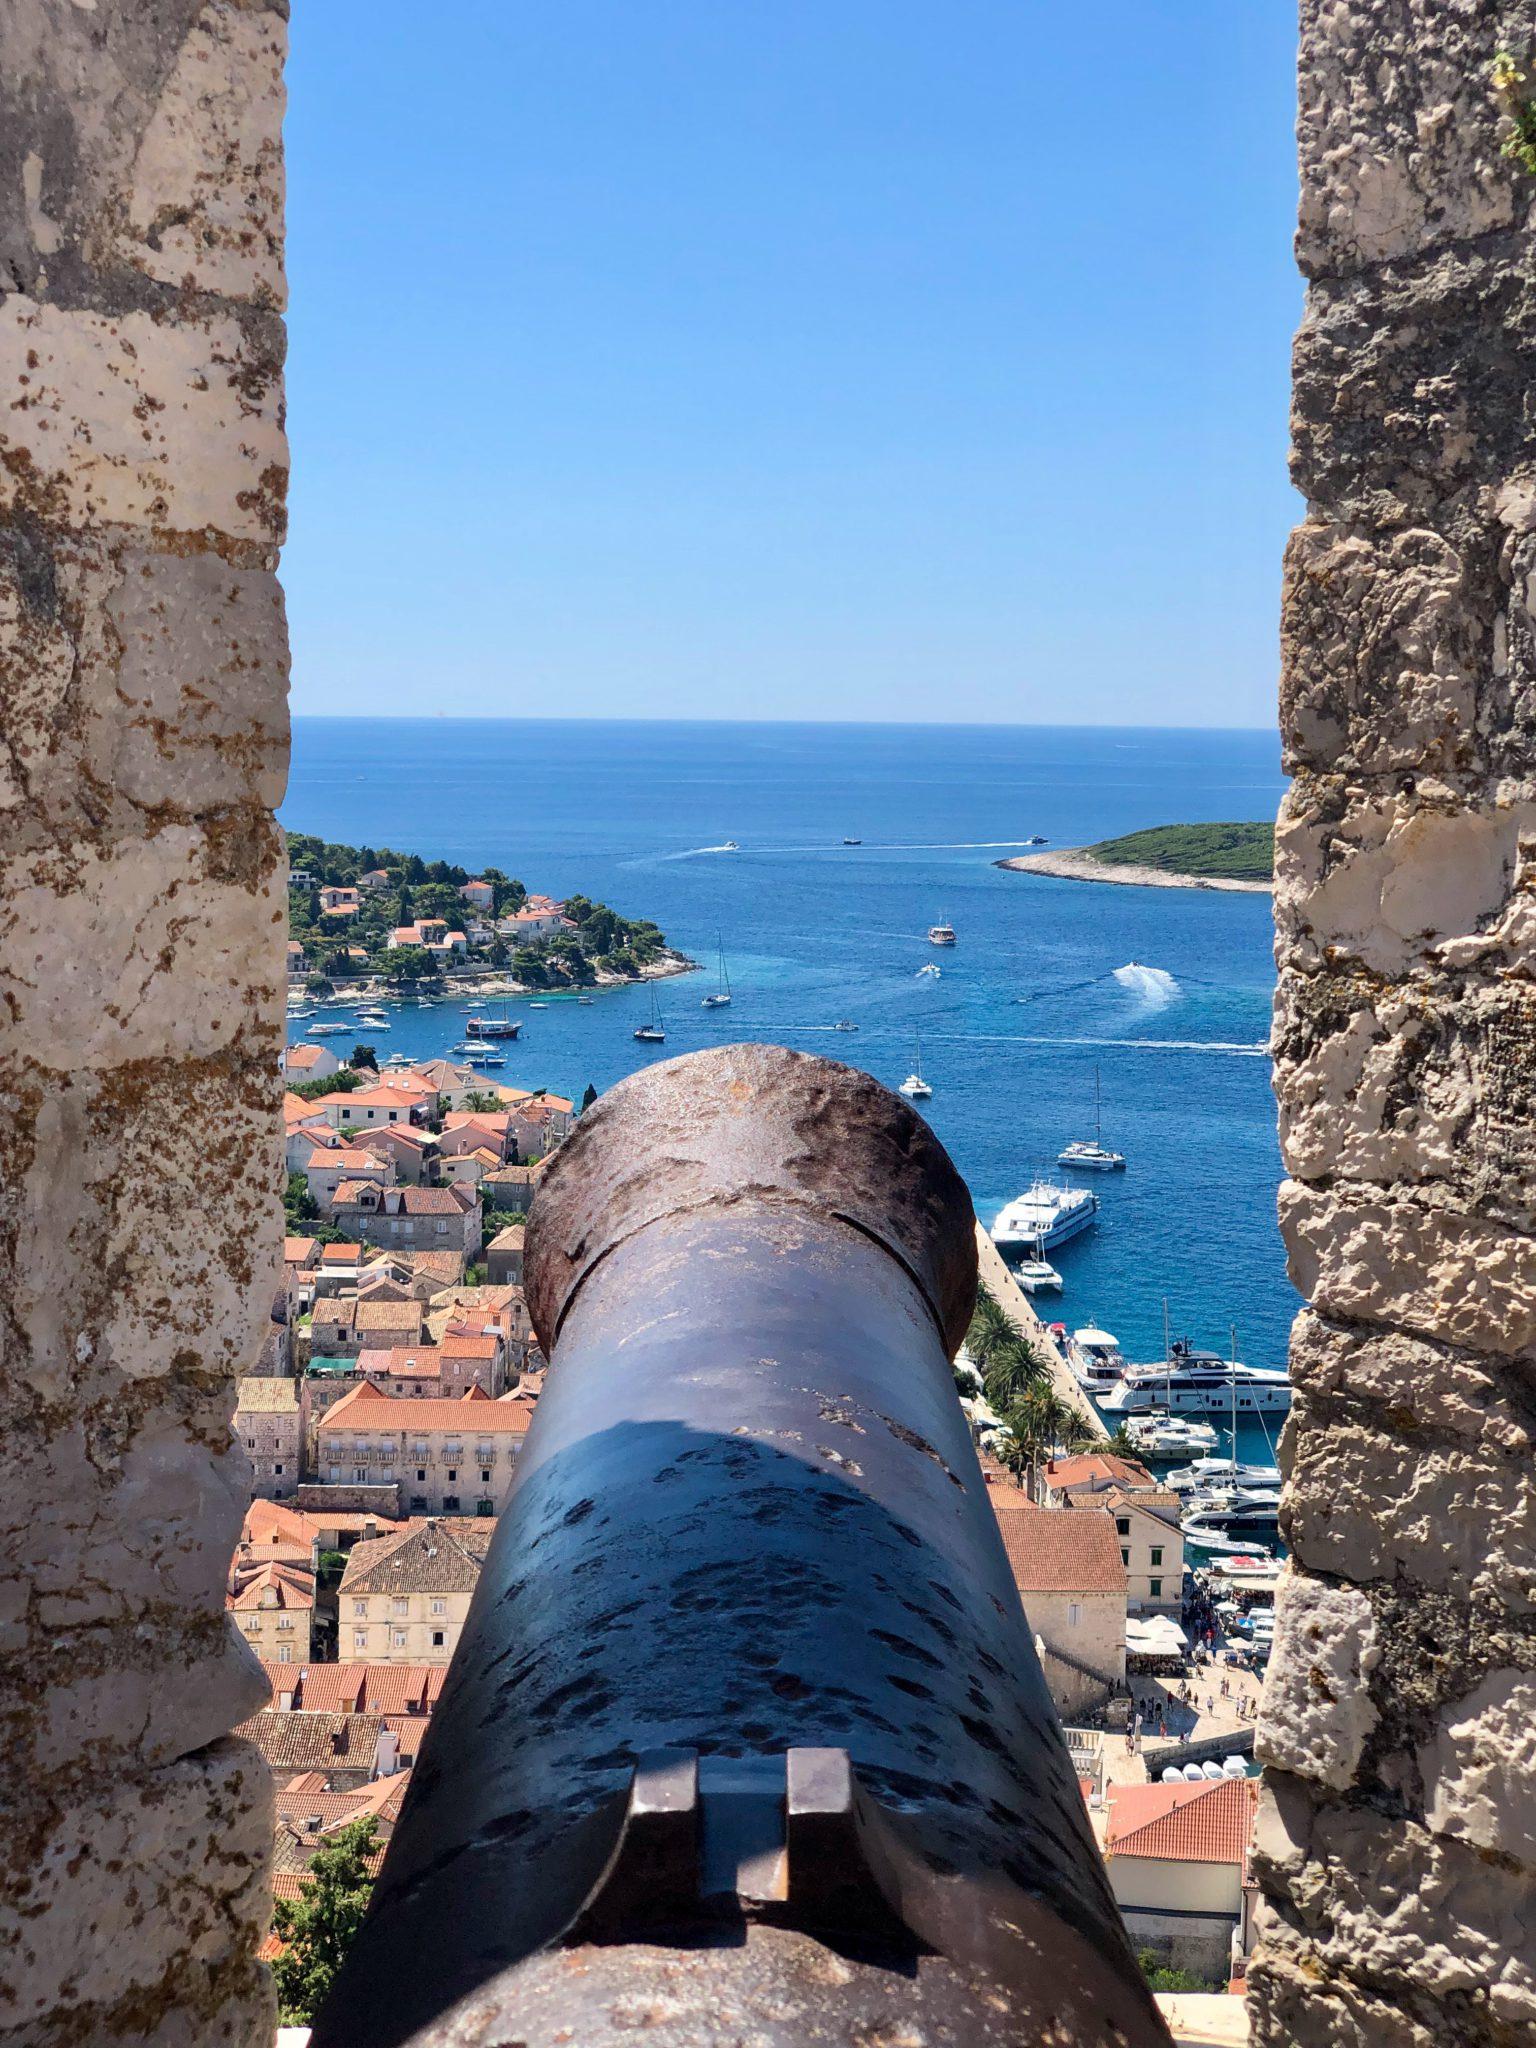 6 Day Walk and Hike the Dalmatian Coast Holiday in Croatia